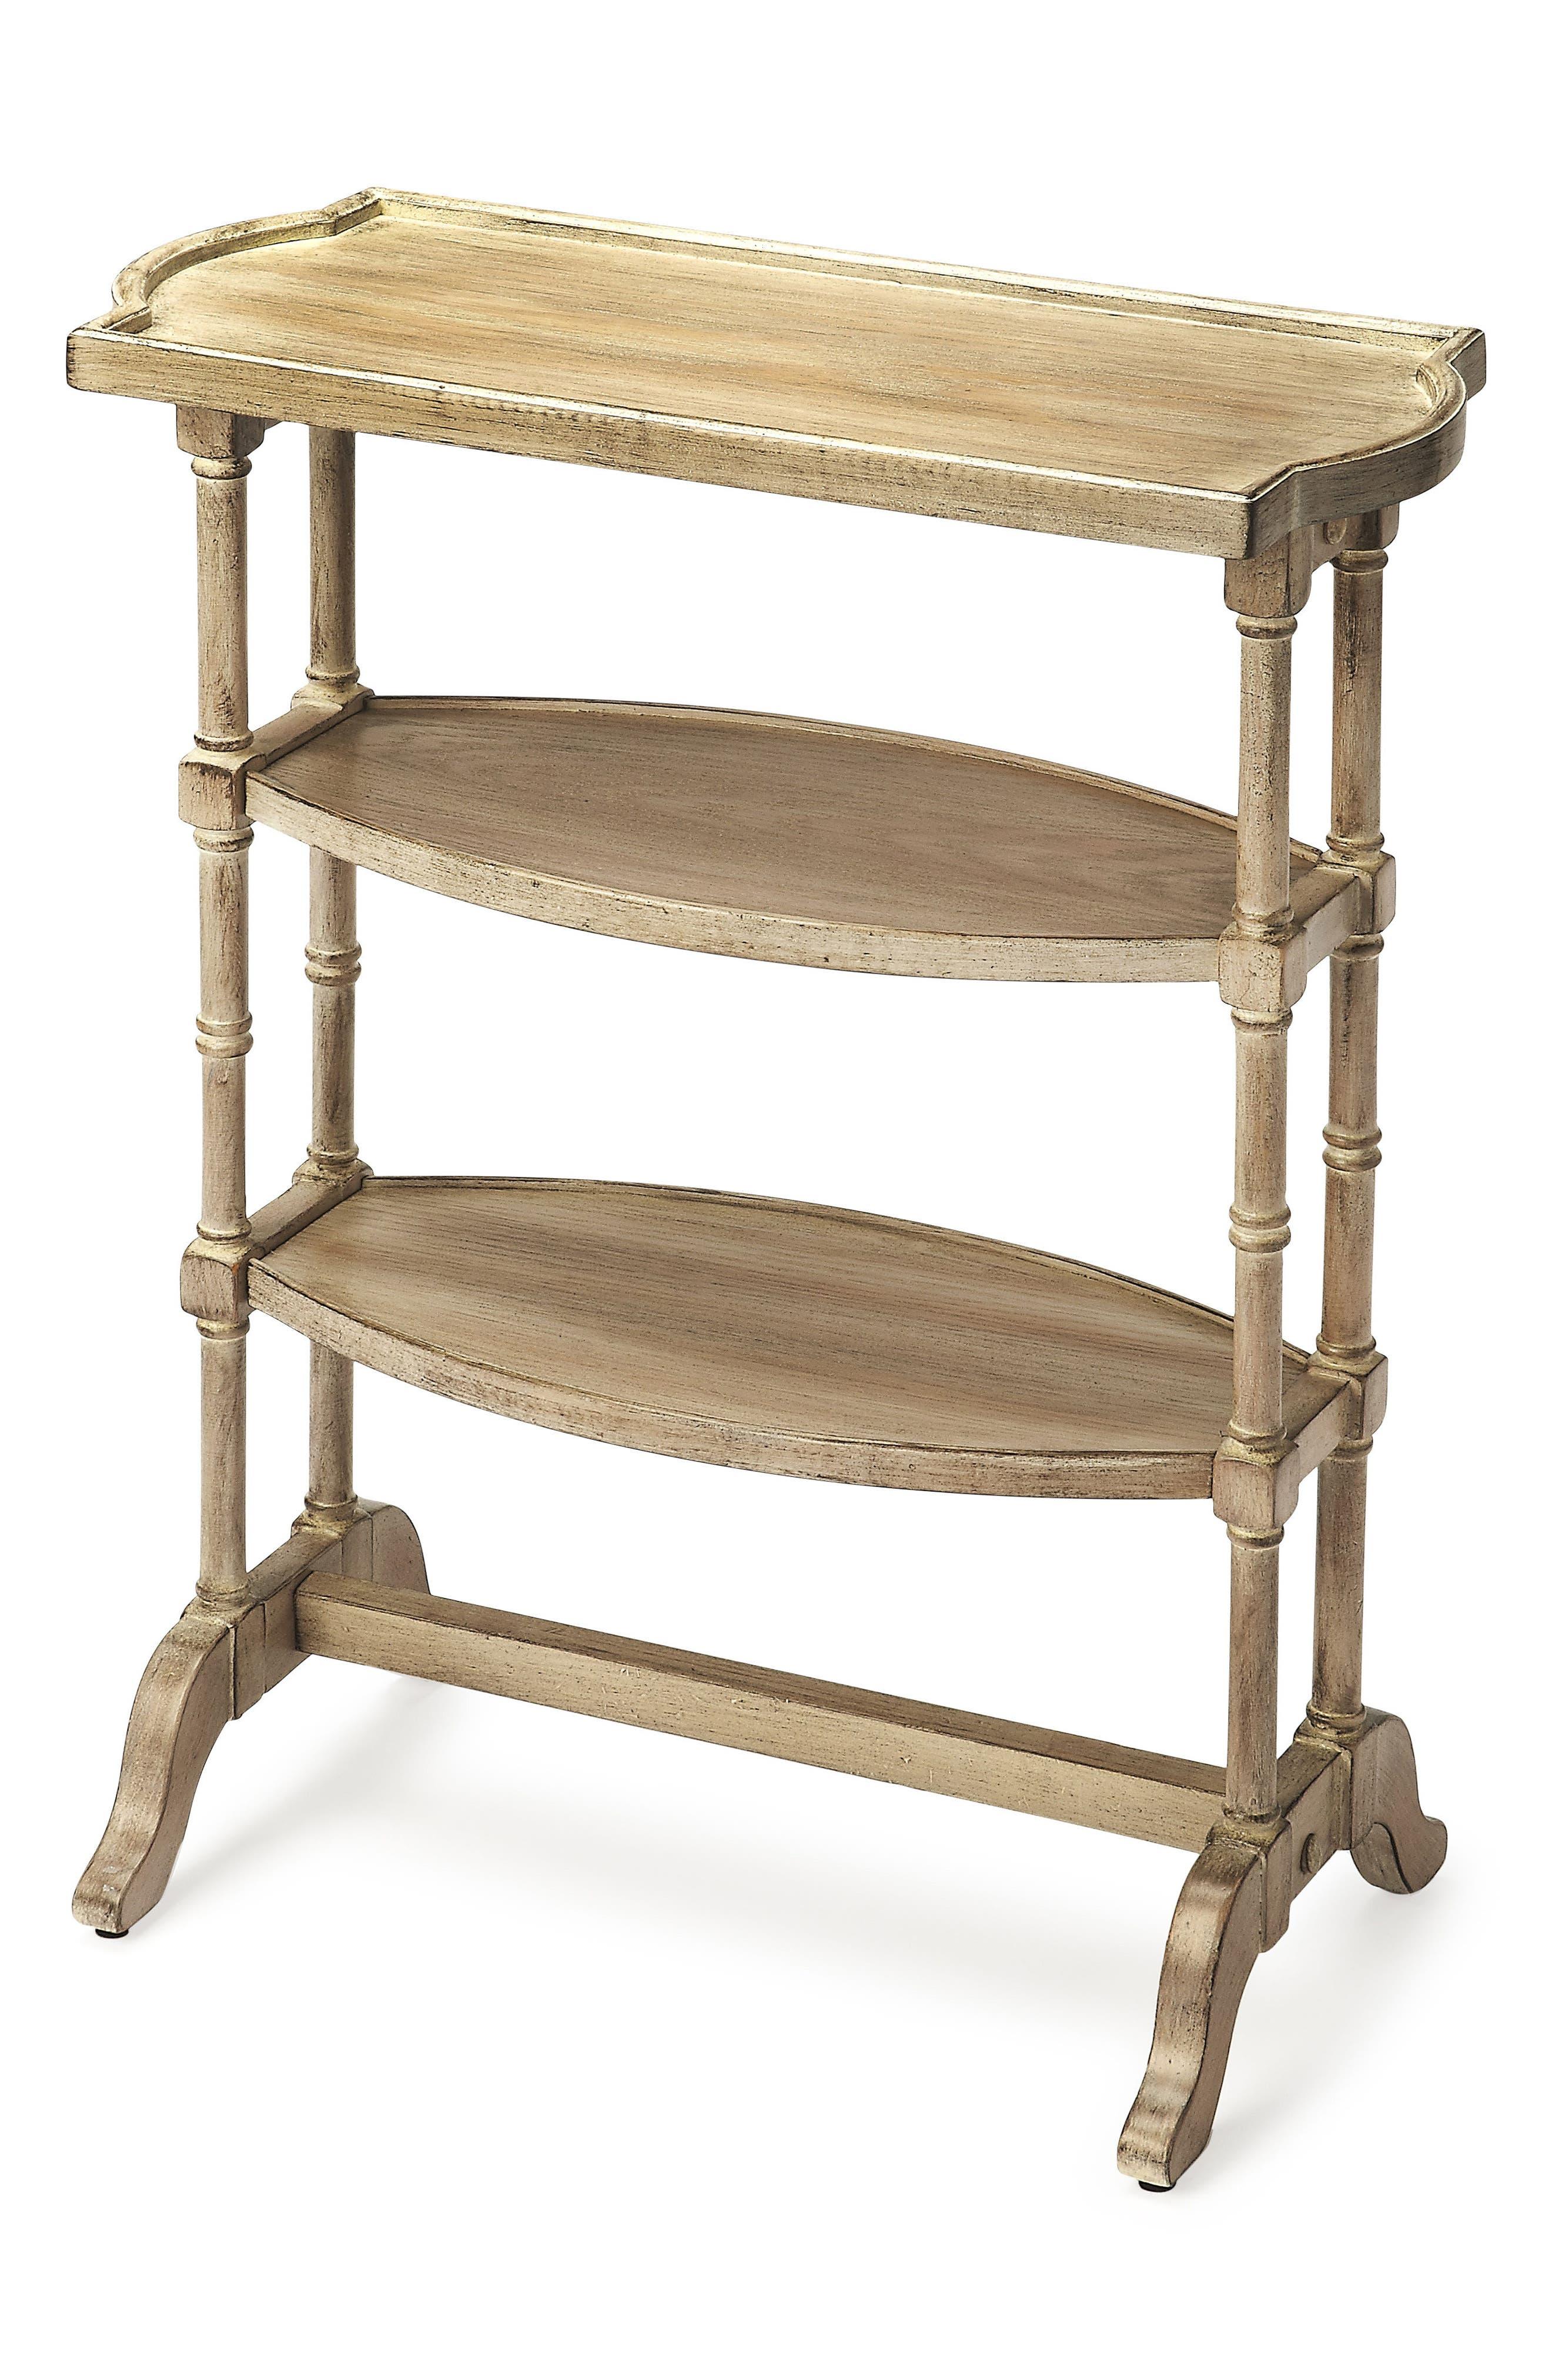 Alternate Image 1 Selected - Butler Wood Side Table